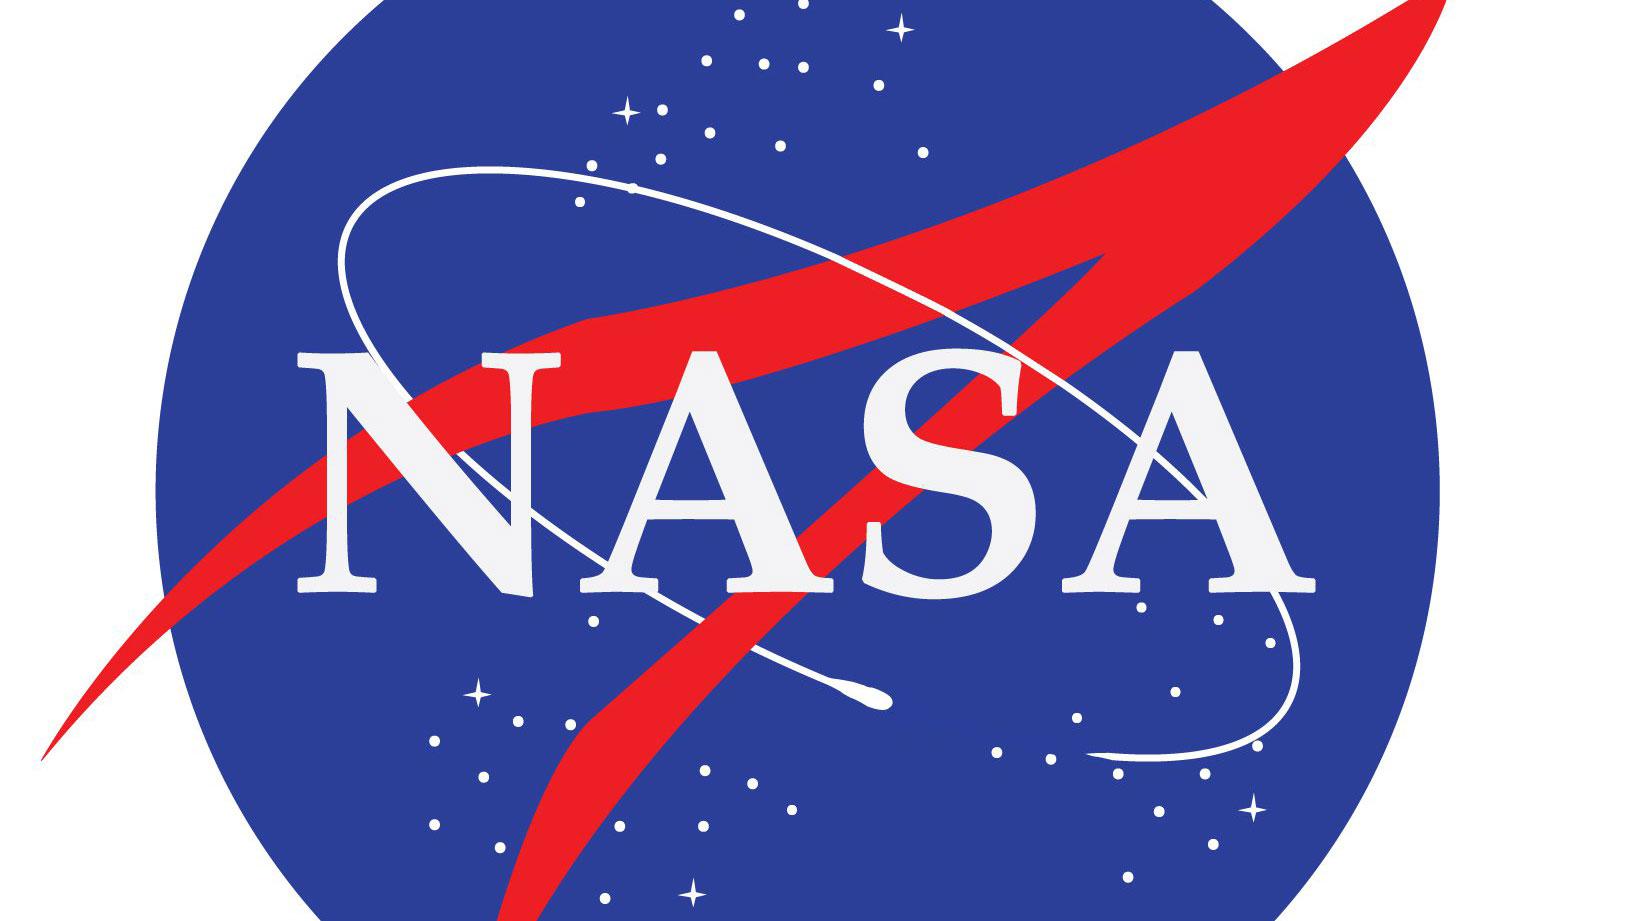 nasa logo 2017 - photo #6